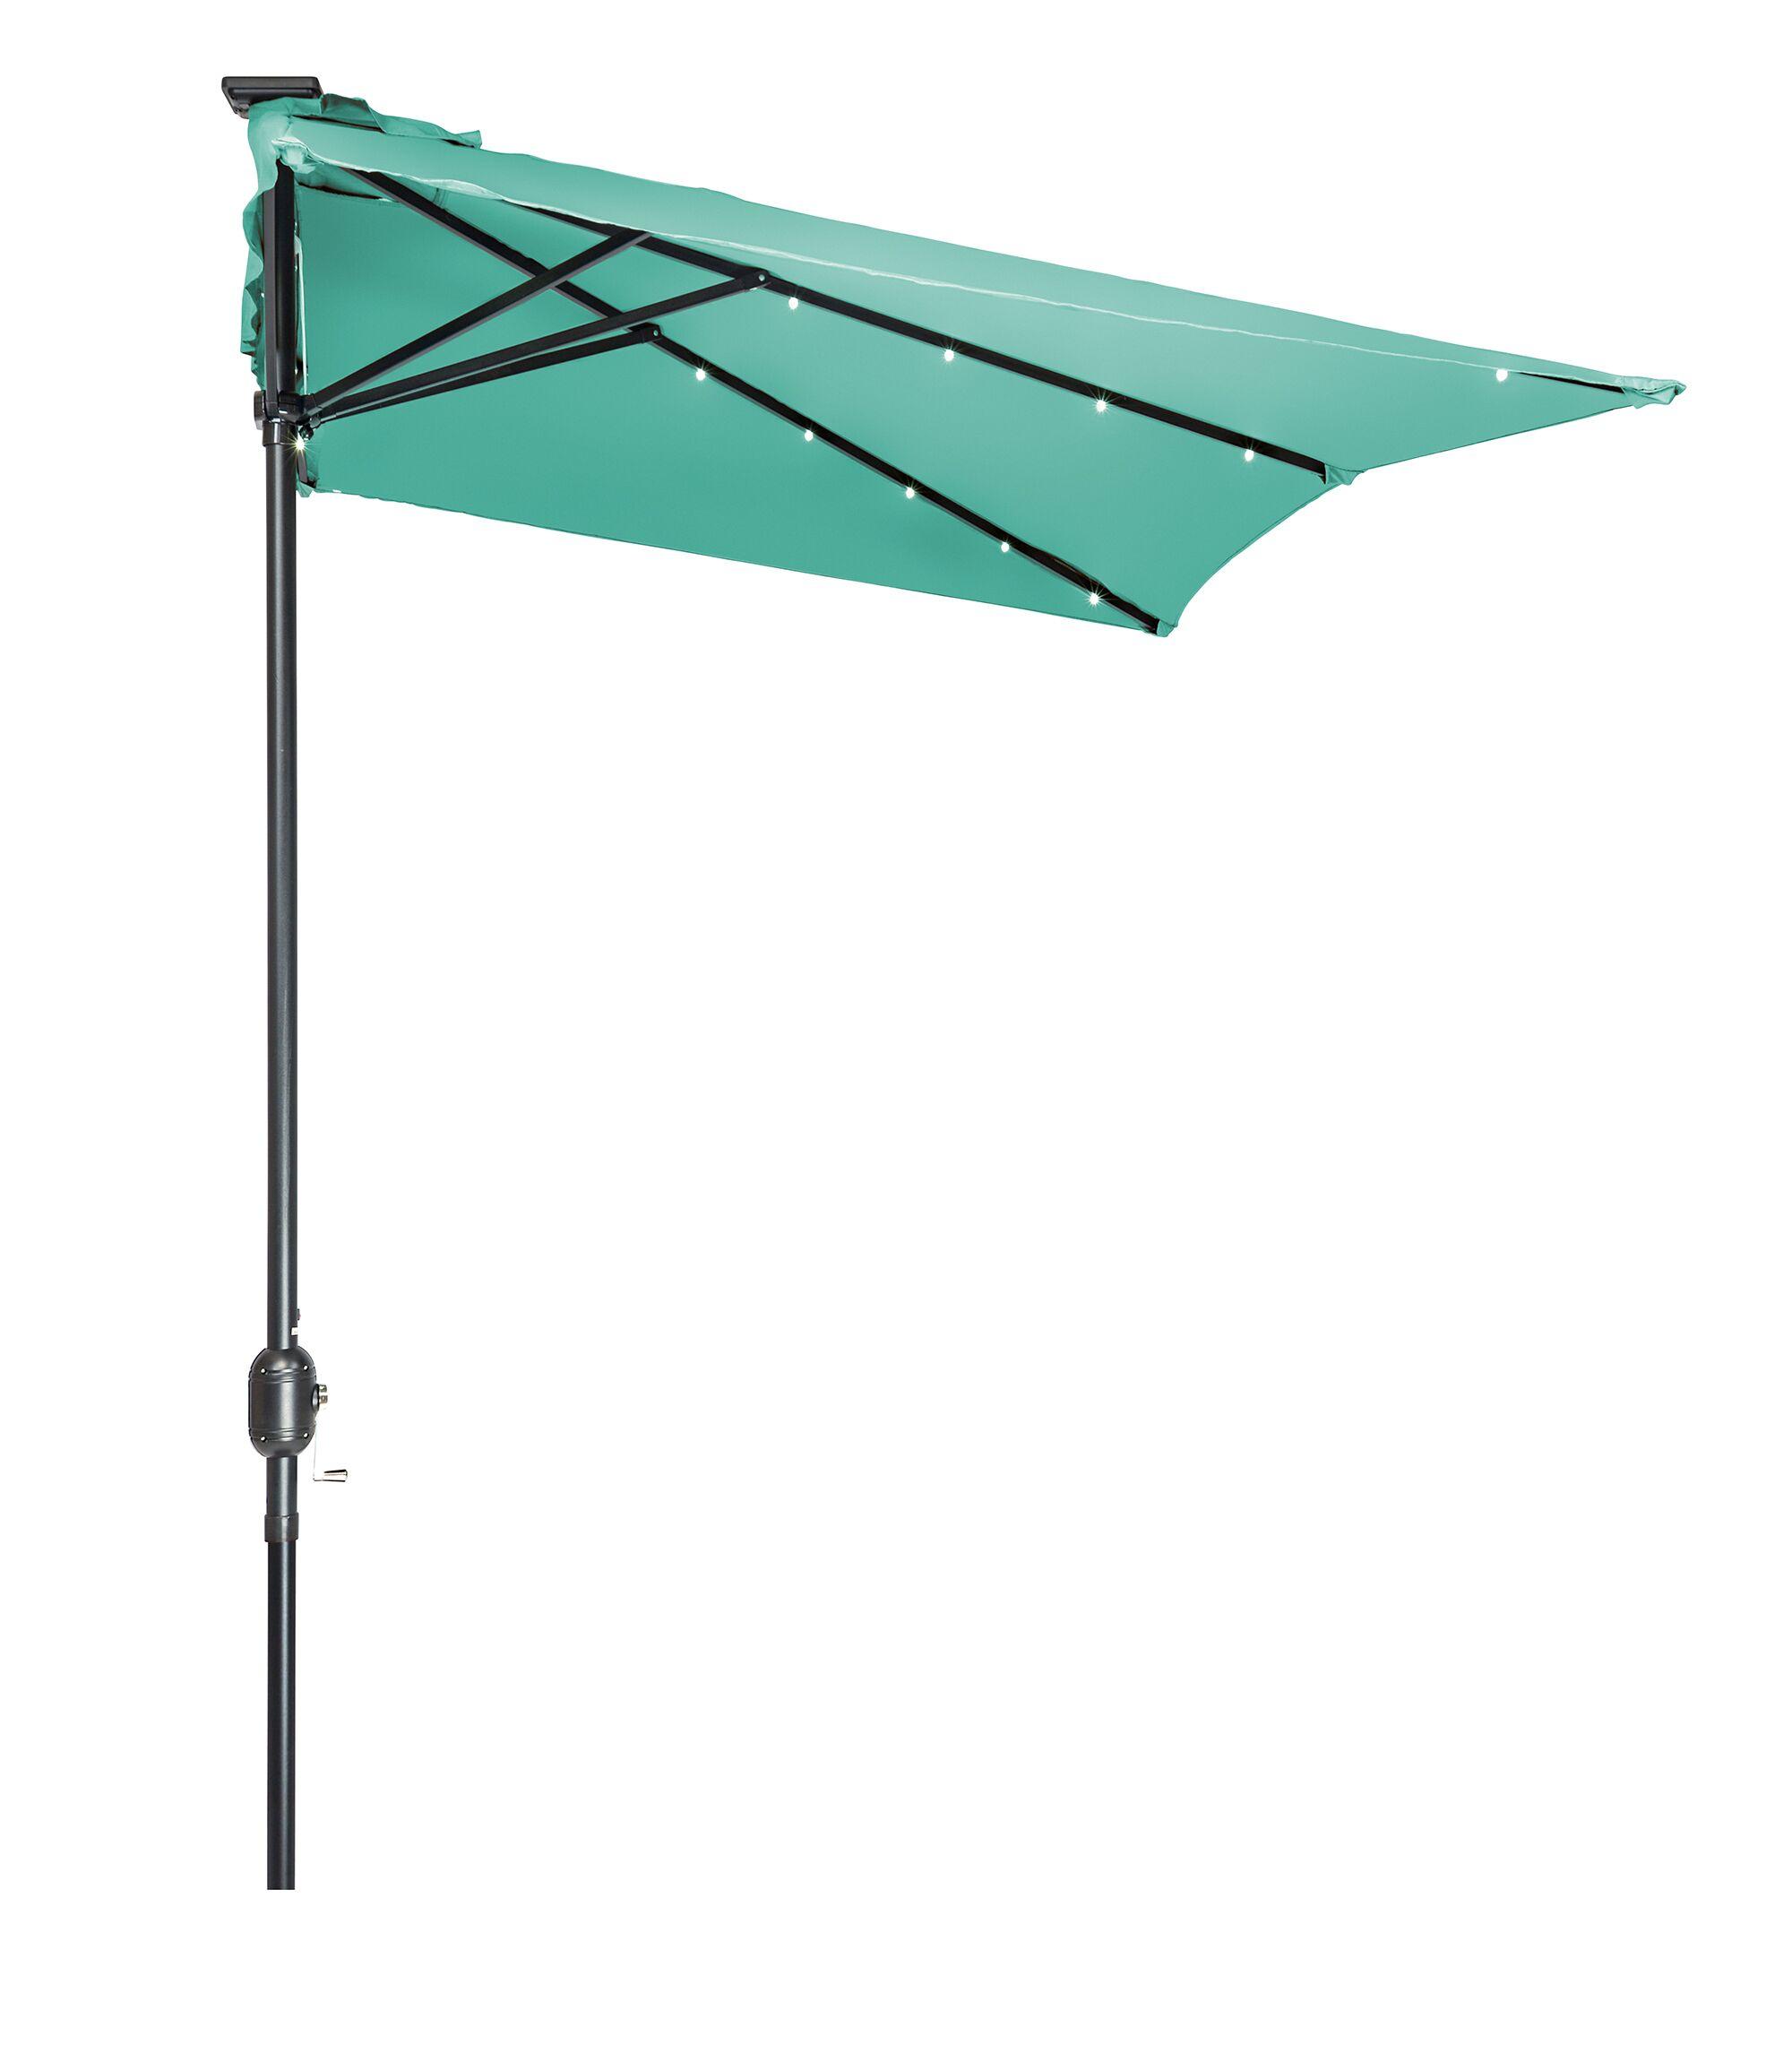 5' x 6.5' Lighted Half Umbrella Fabric: Teal